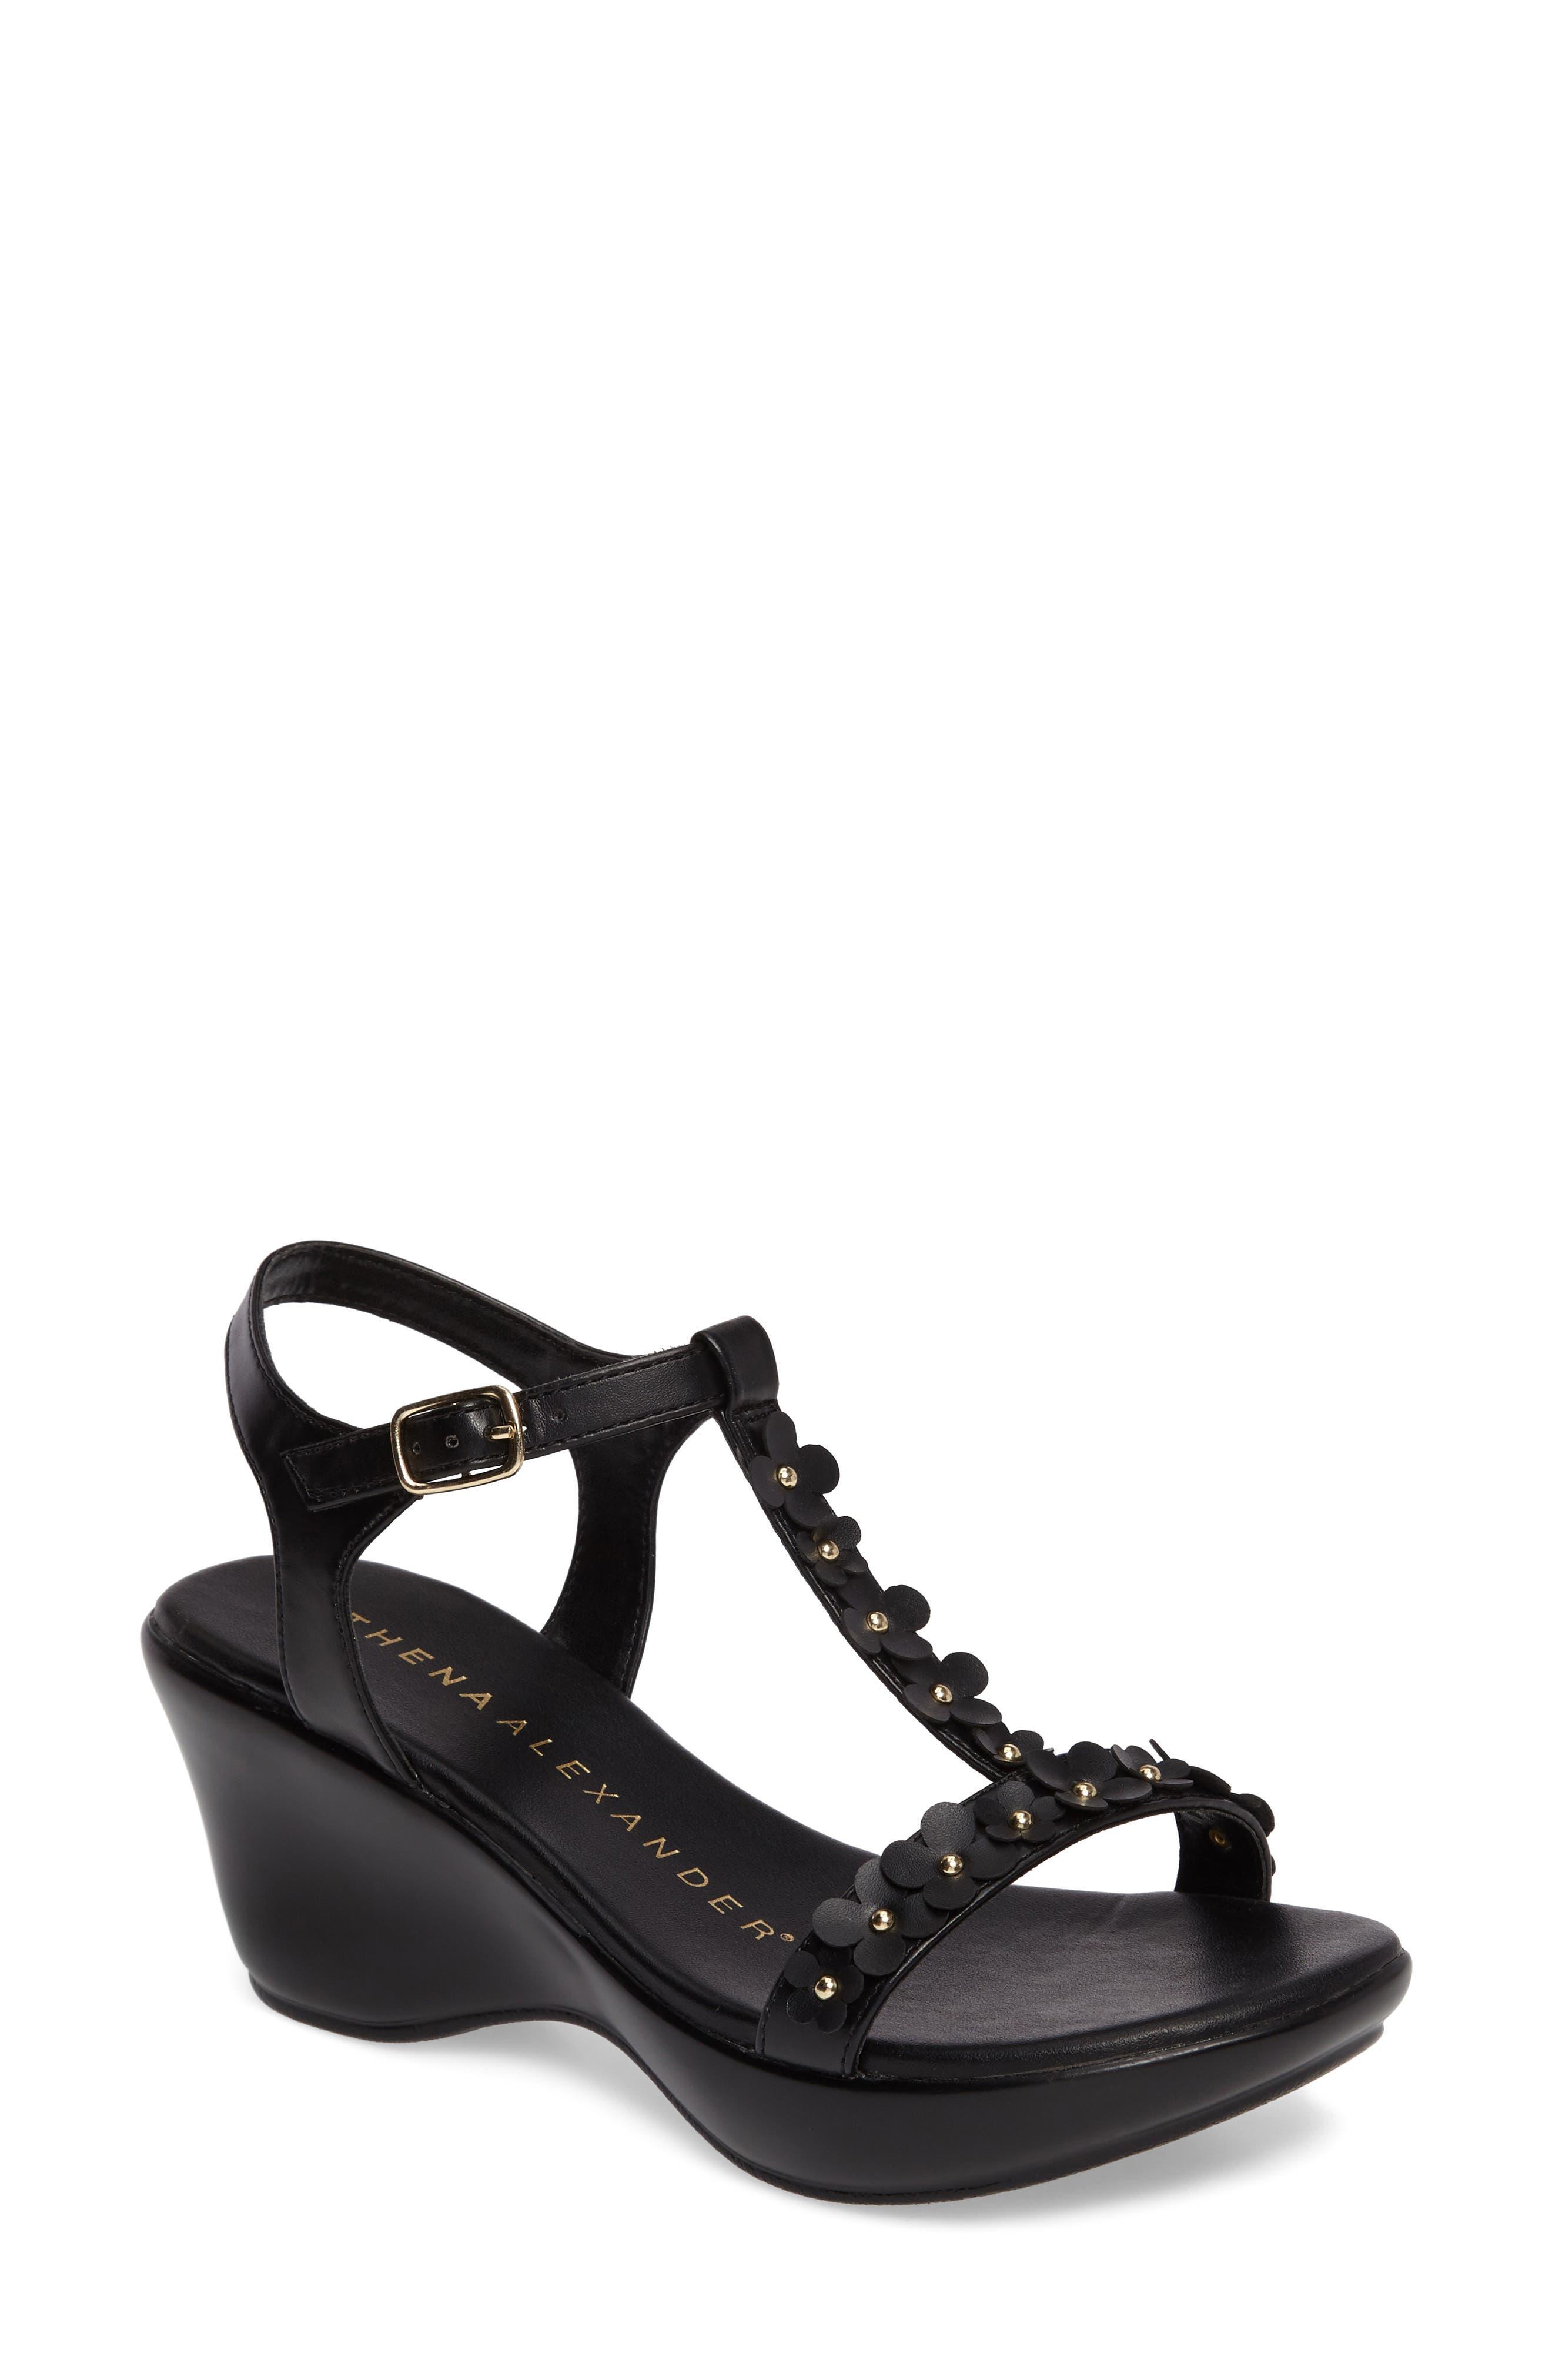 Evelina Sandal,                             Main thumbnail 1, color,                             Black Faux Leather